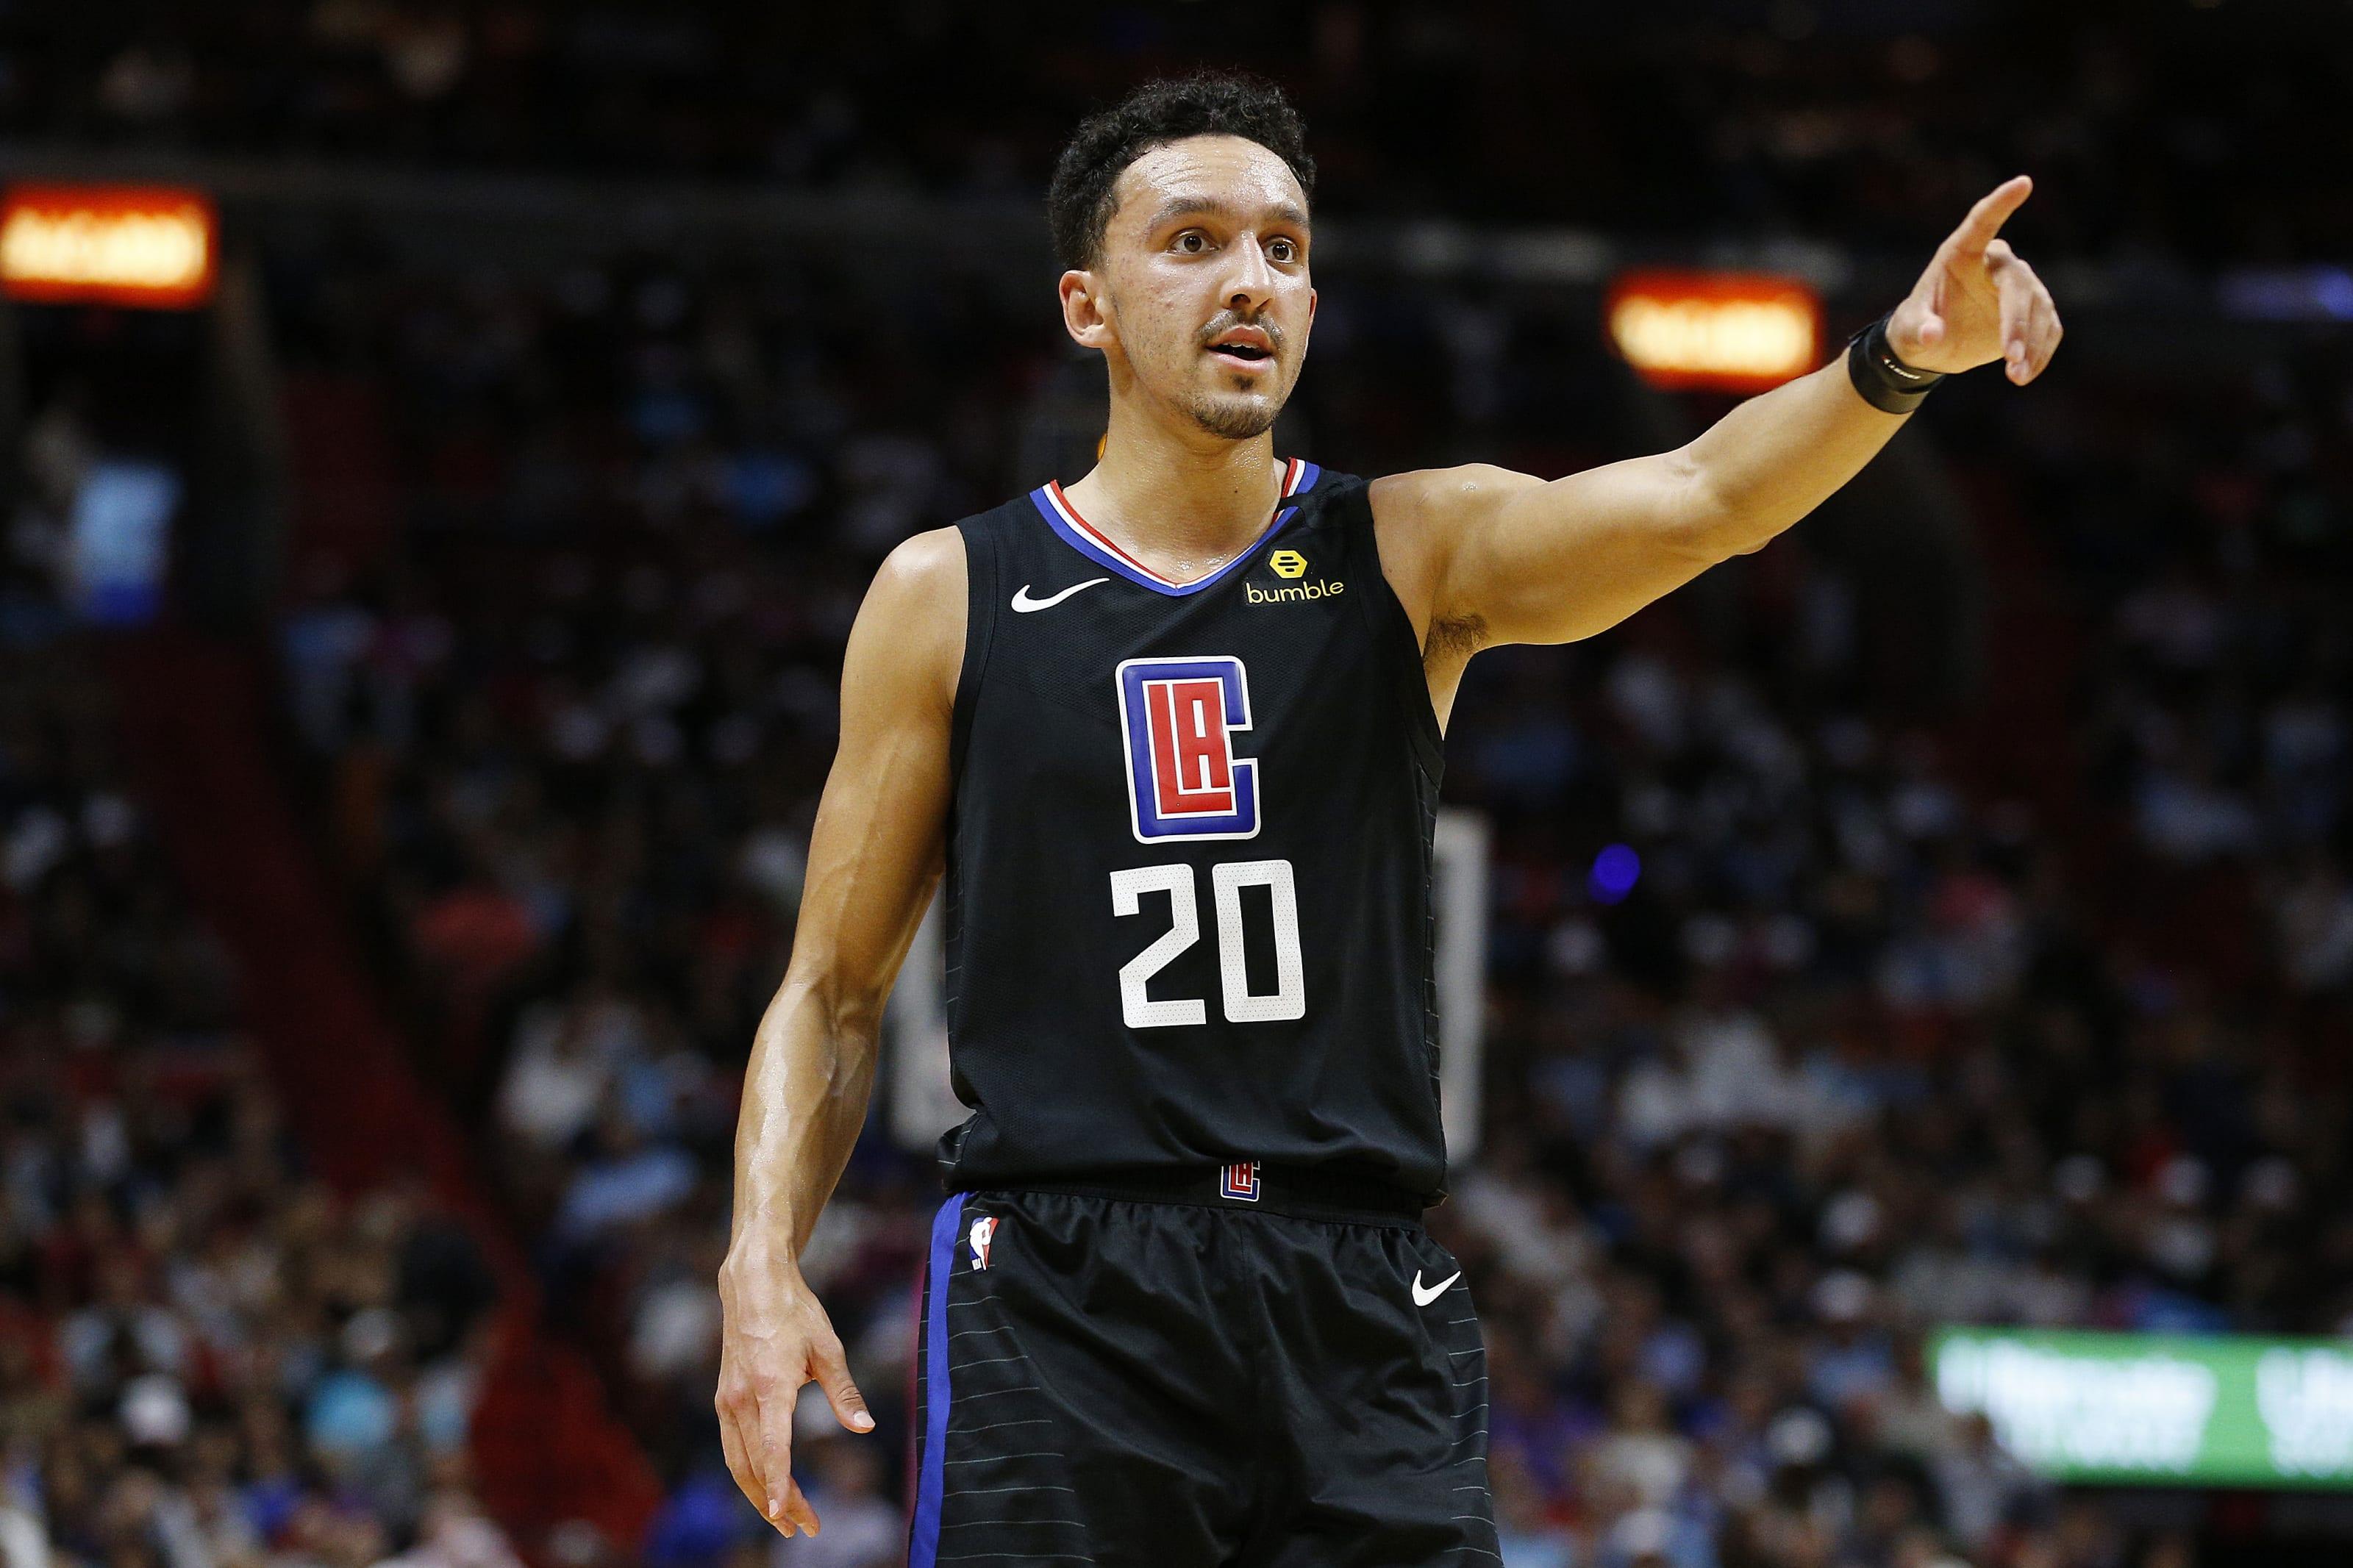 LA Clippers Landry Shamet